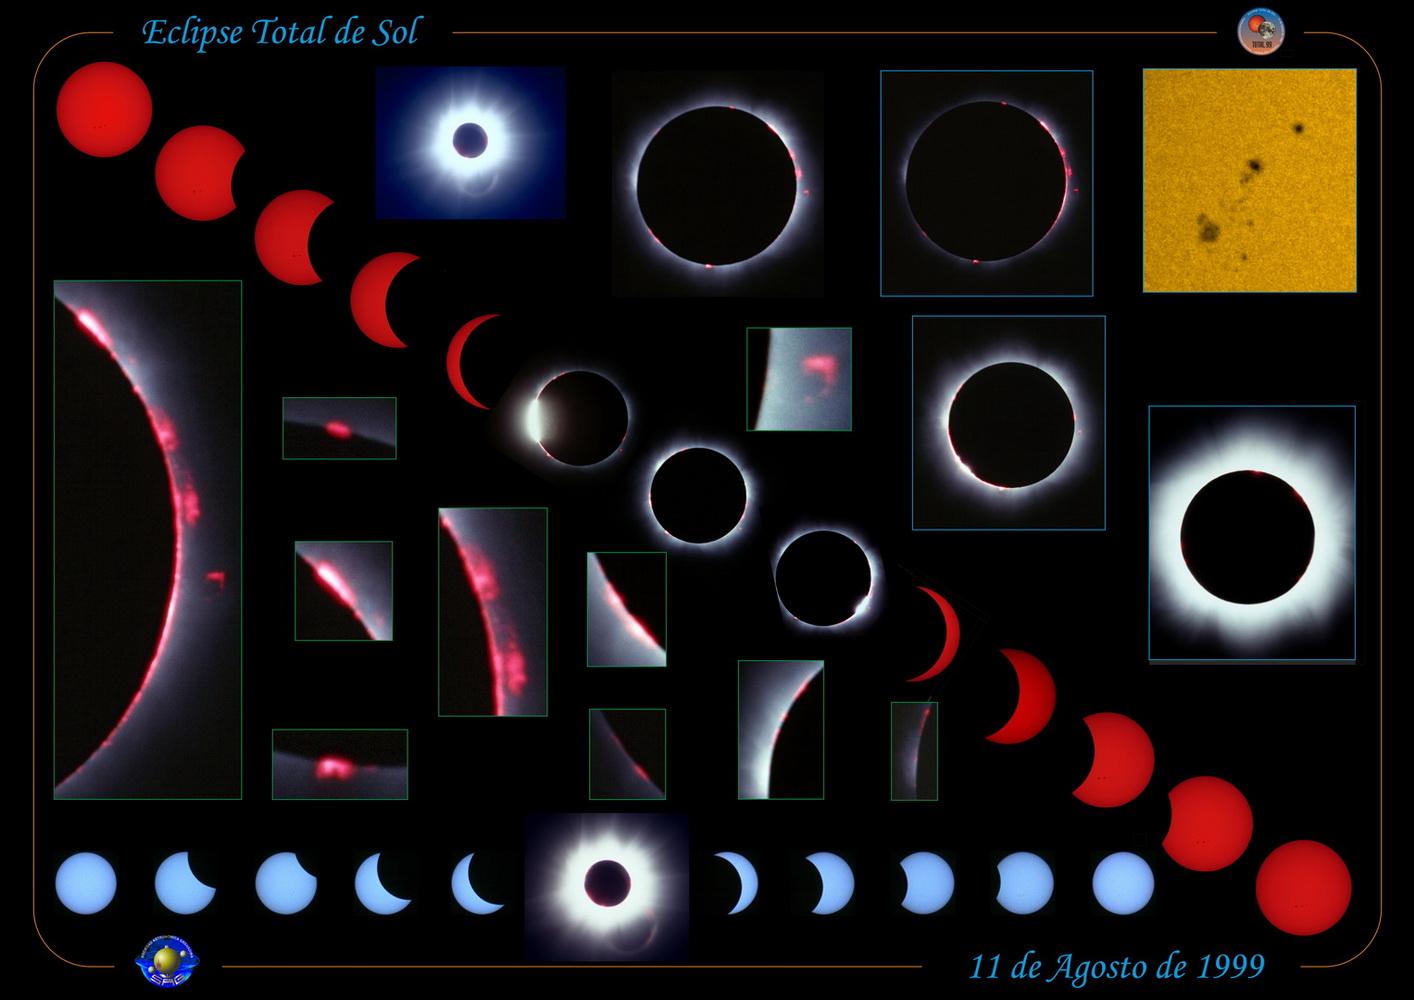 Eclipse total de Sol - 11, ago. 1999